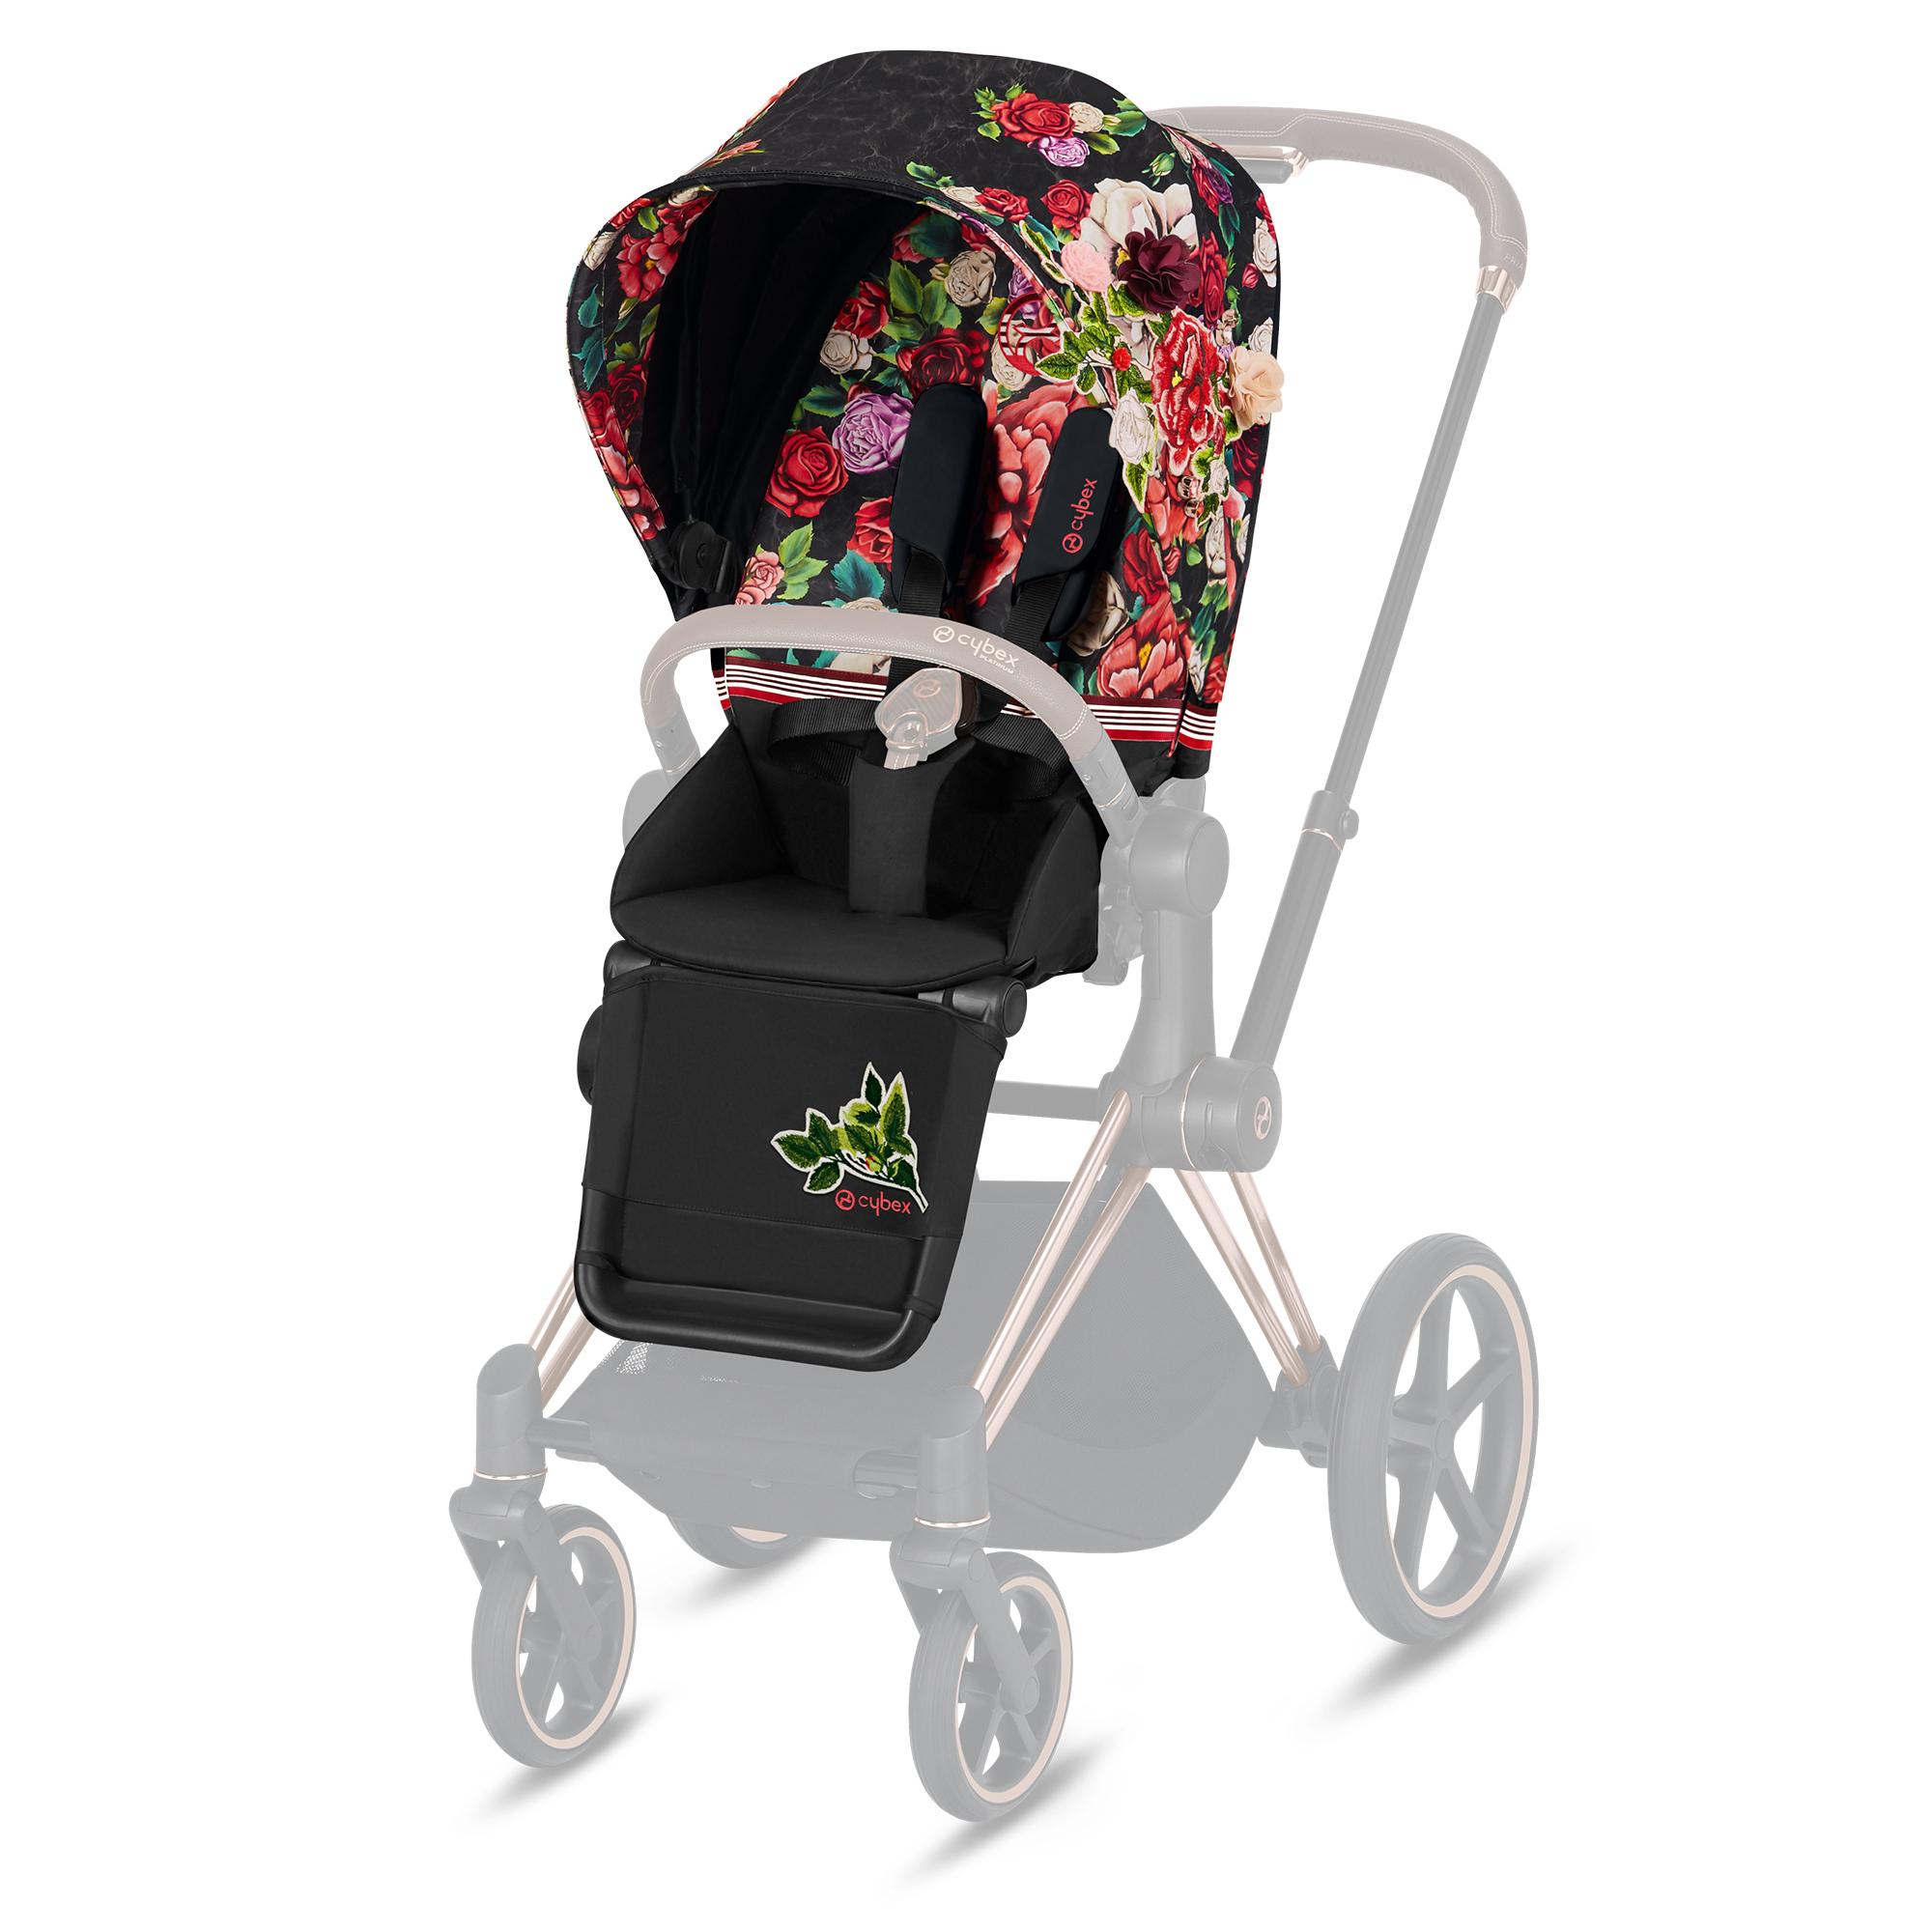 CYBEX PRIAM Spring Blossom Dark - Seat Pack